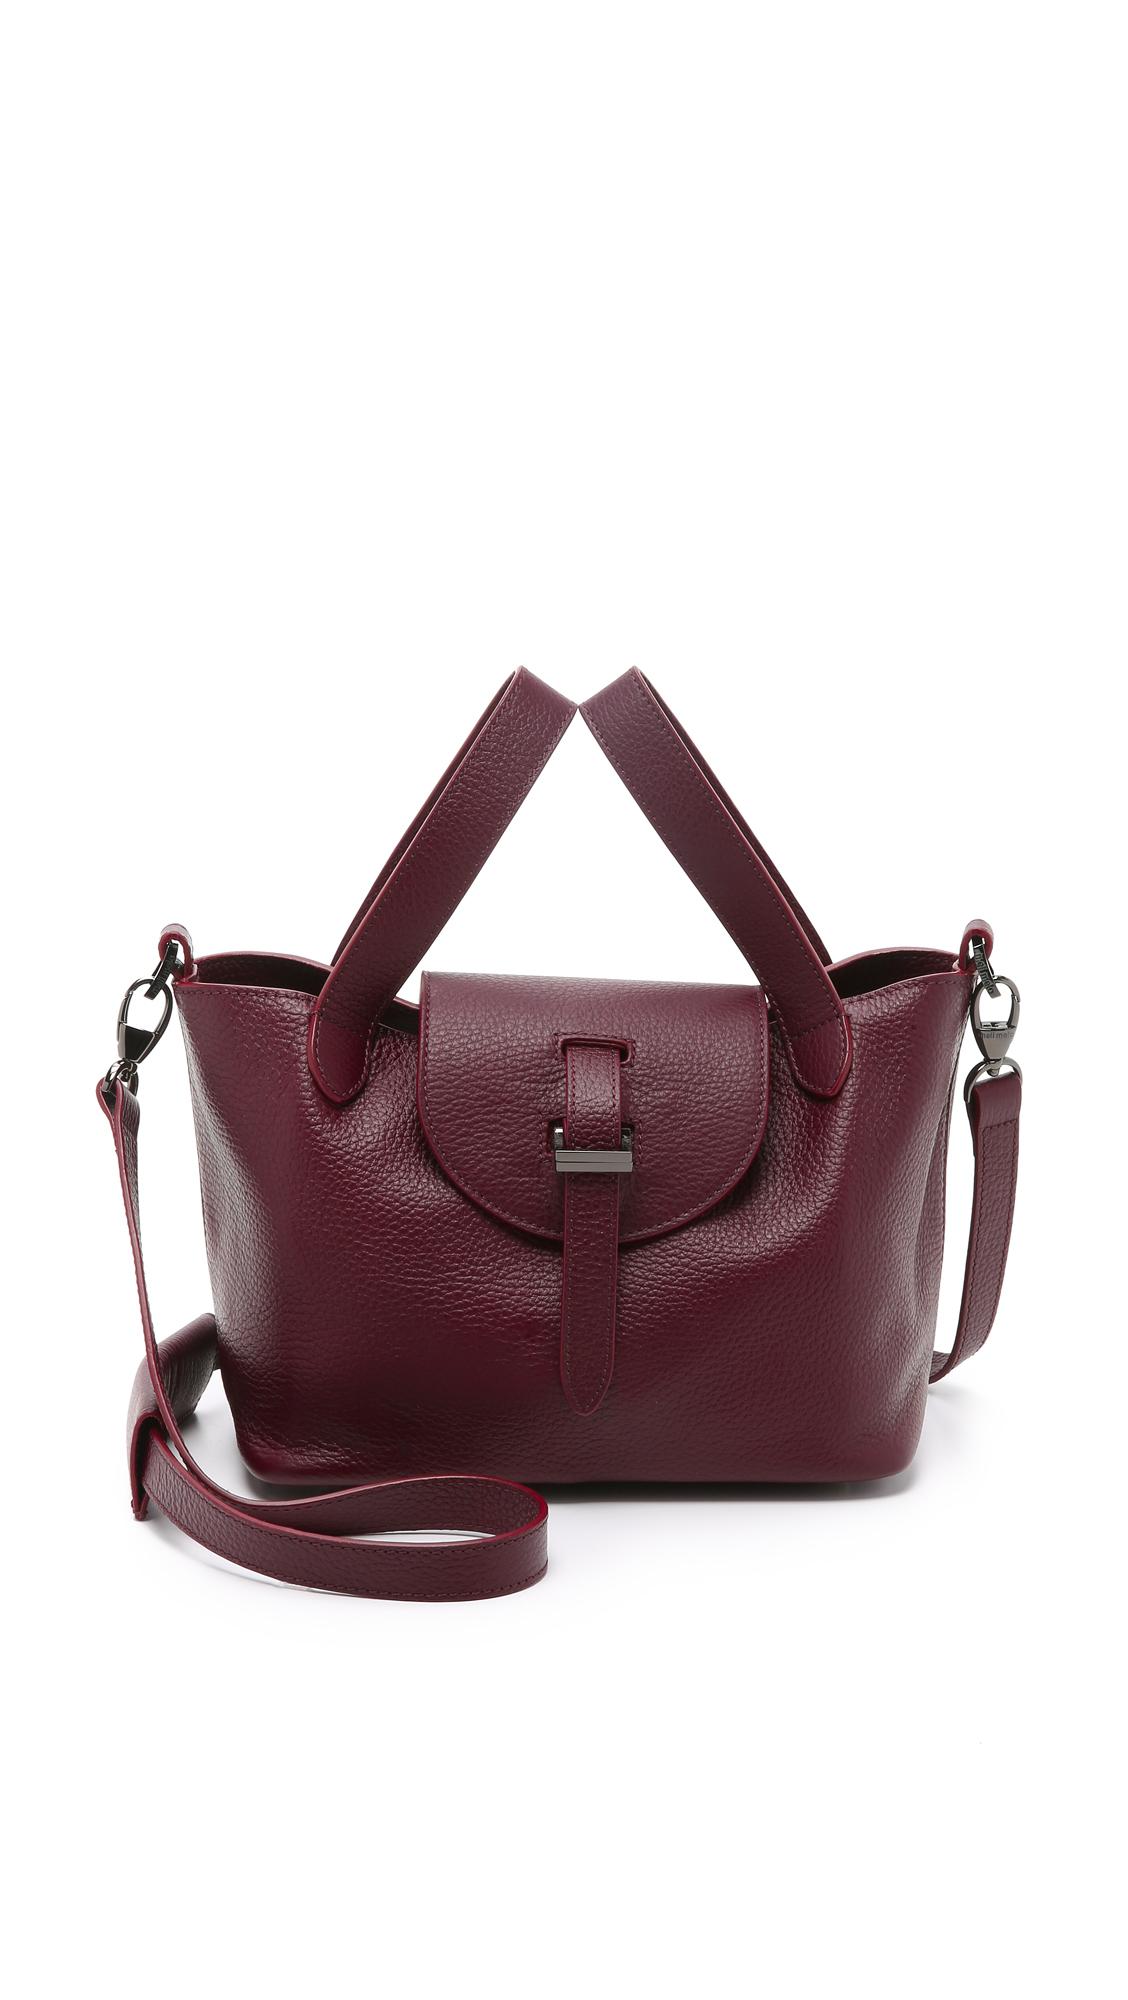 Lyst - meli melo Thela Mini Bag - Burgundy in Purple b395ea197c803